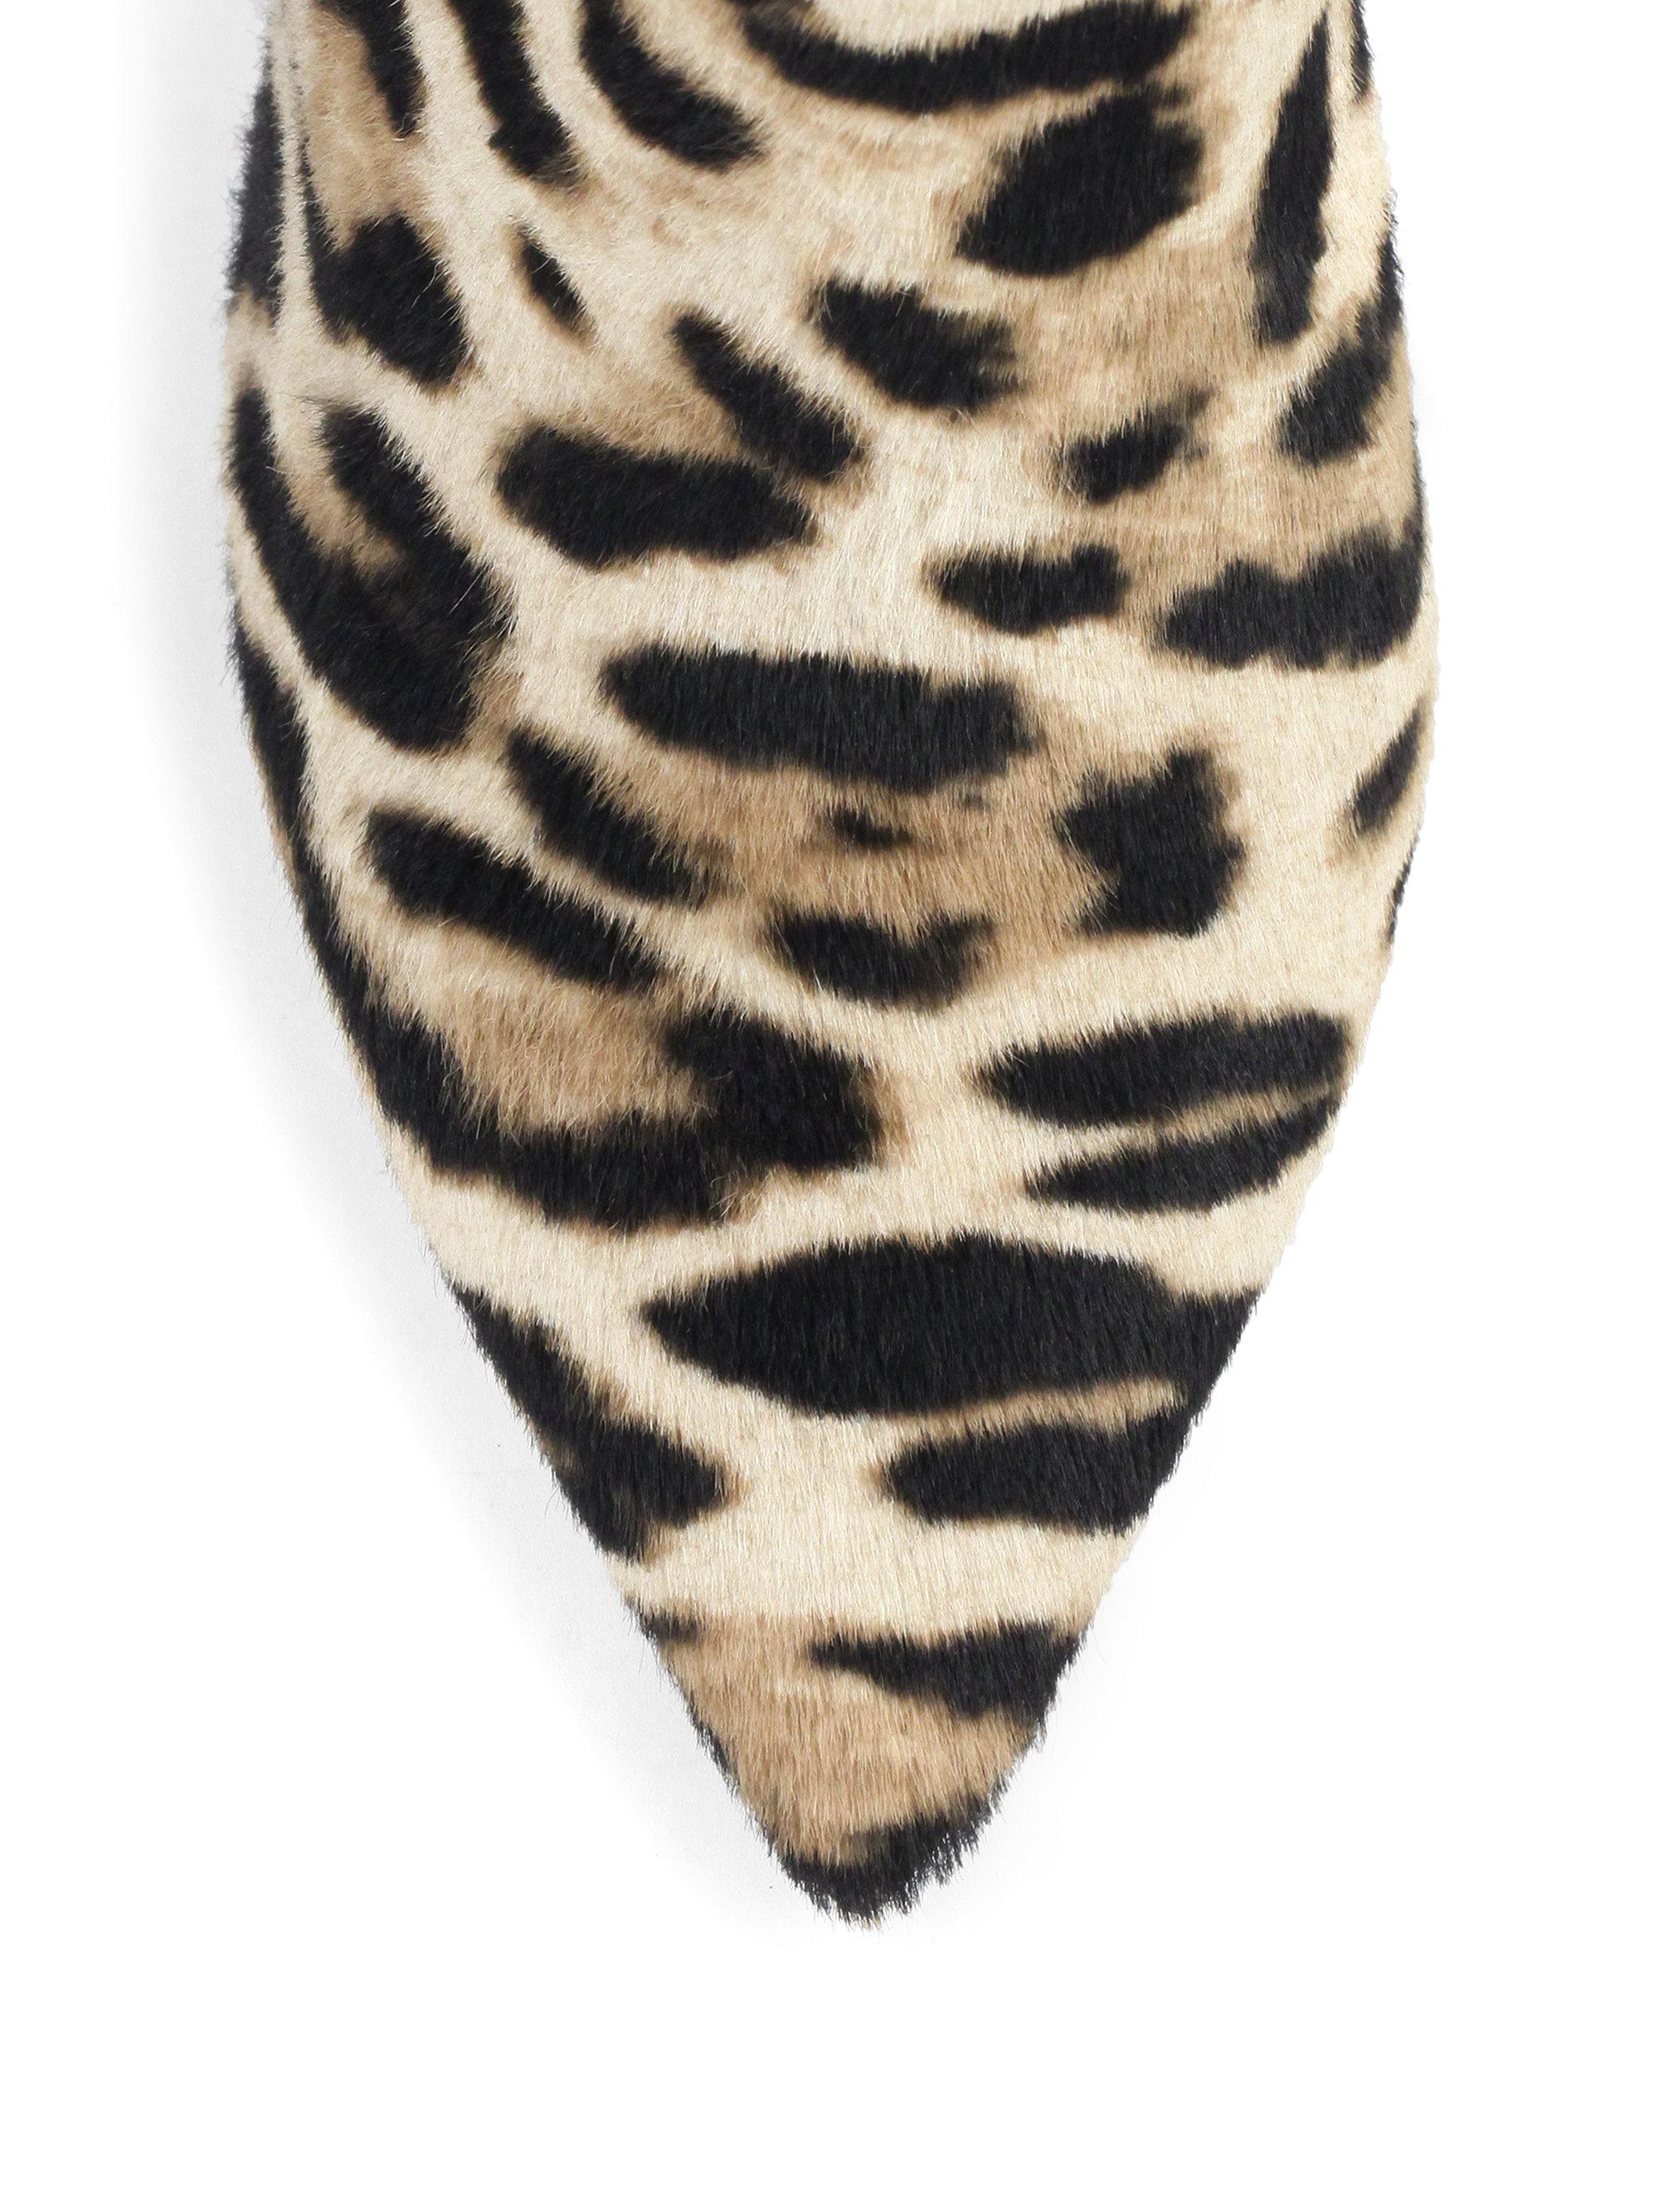 740677f6135 Lyst - Jimmy Choo Liesl Leopard-print Calf Hair Booties in Natural